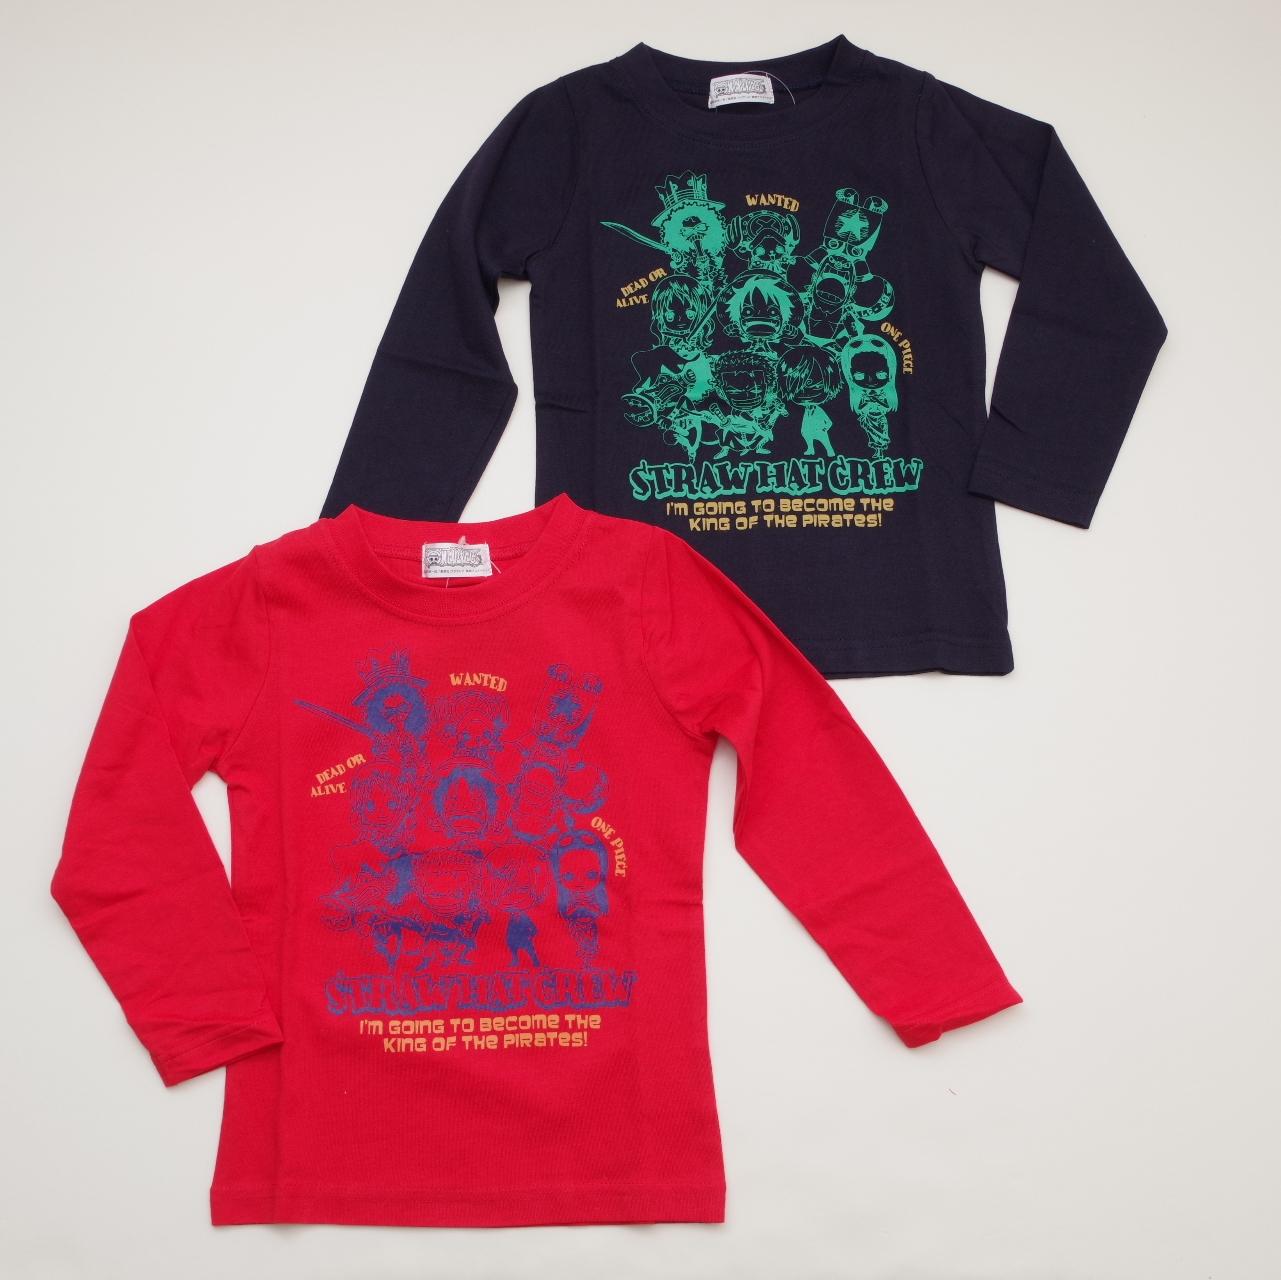 ONE PIECE(ワンピース) 長袖Tシャツ100-130cm( 54J300)